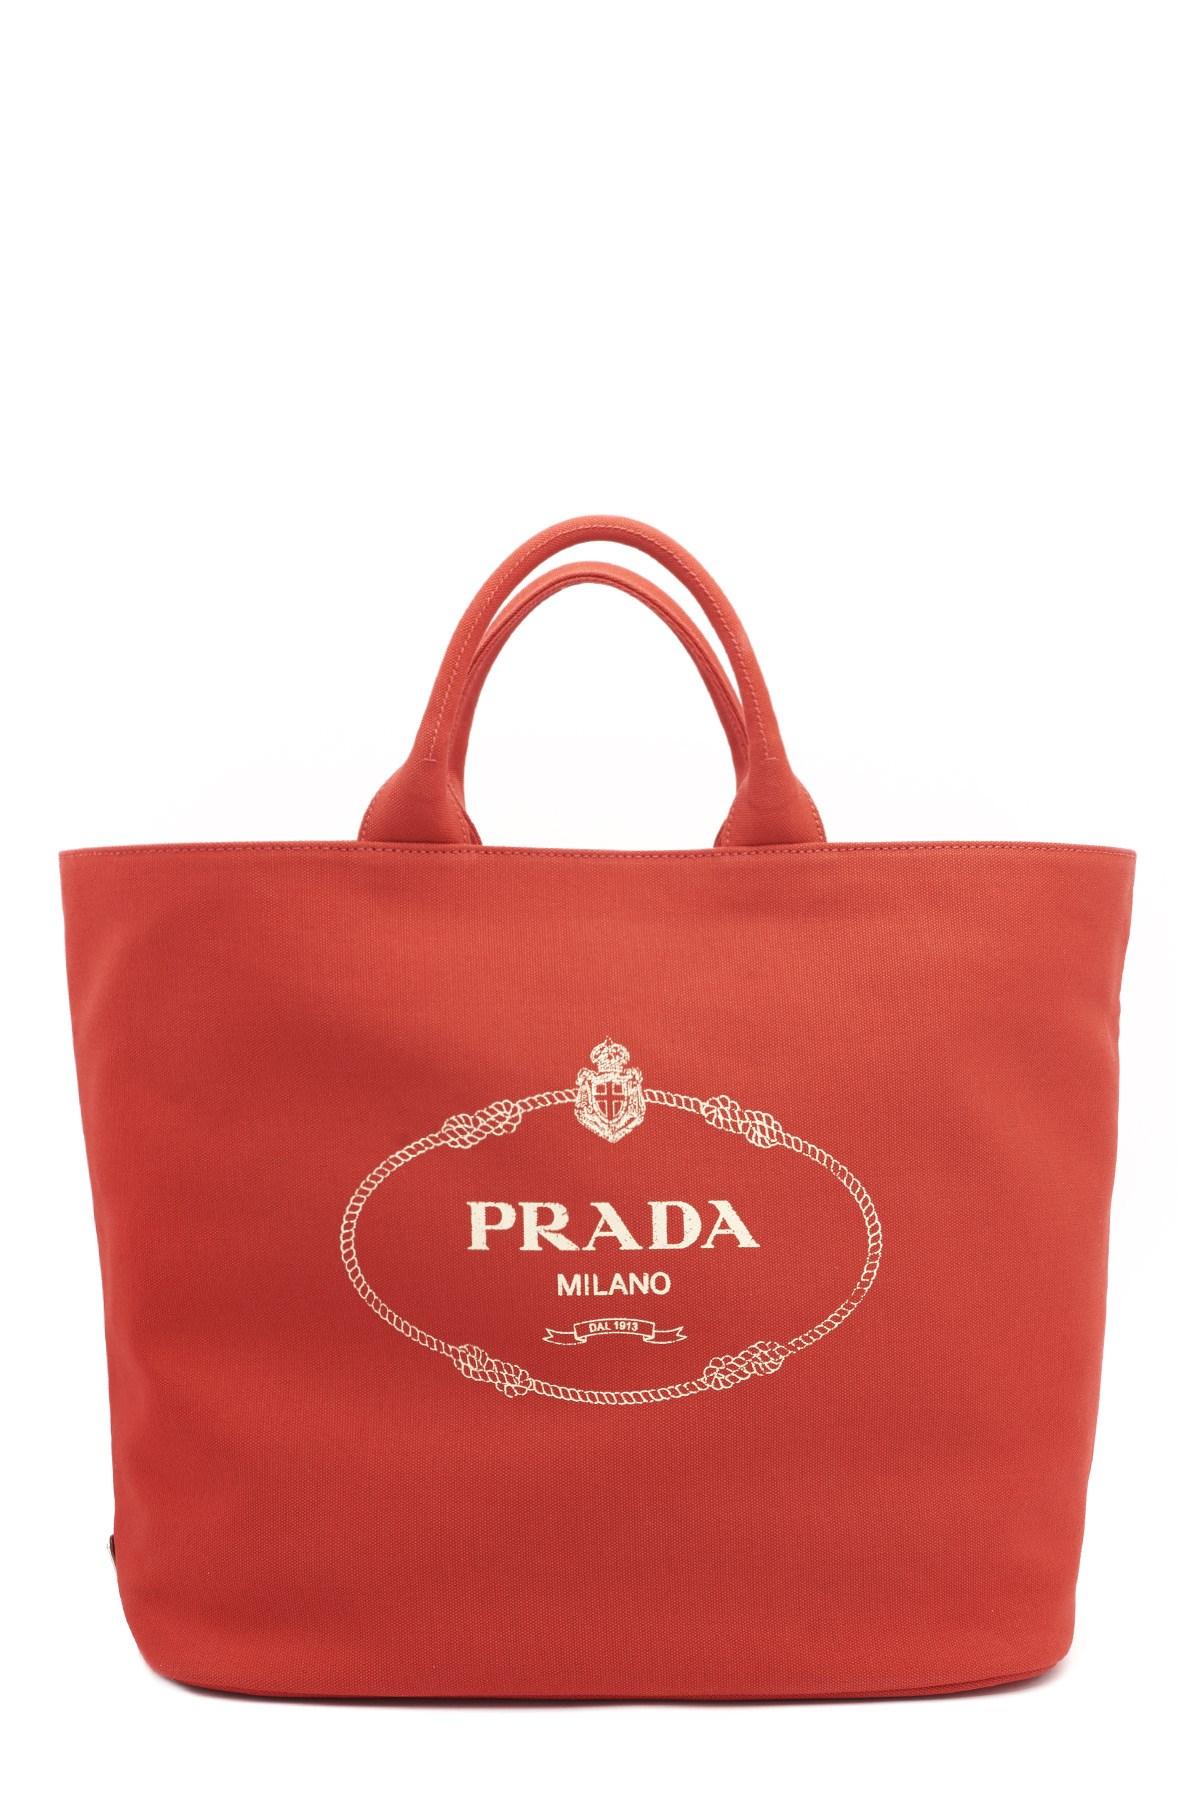 8154ba4d47a3 prada 'Giardiniera' tote available on julian-fashion.com - 62118